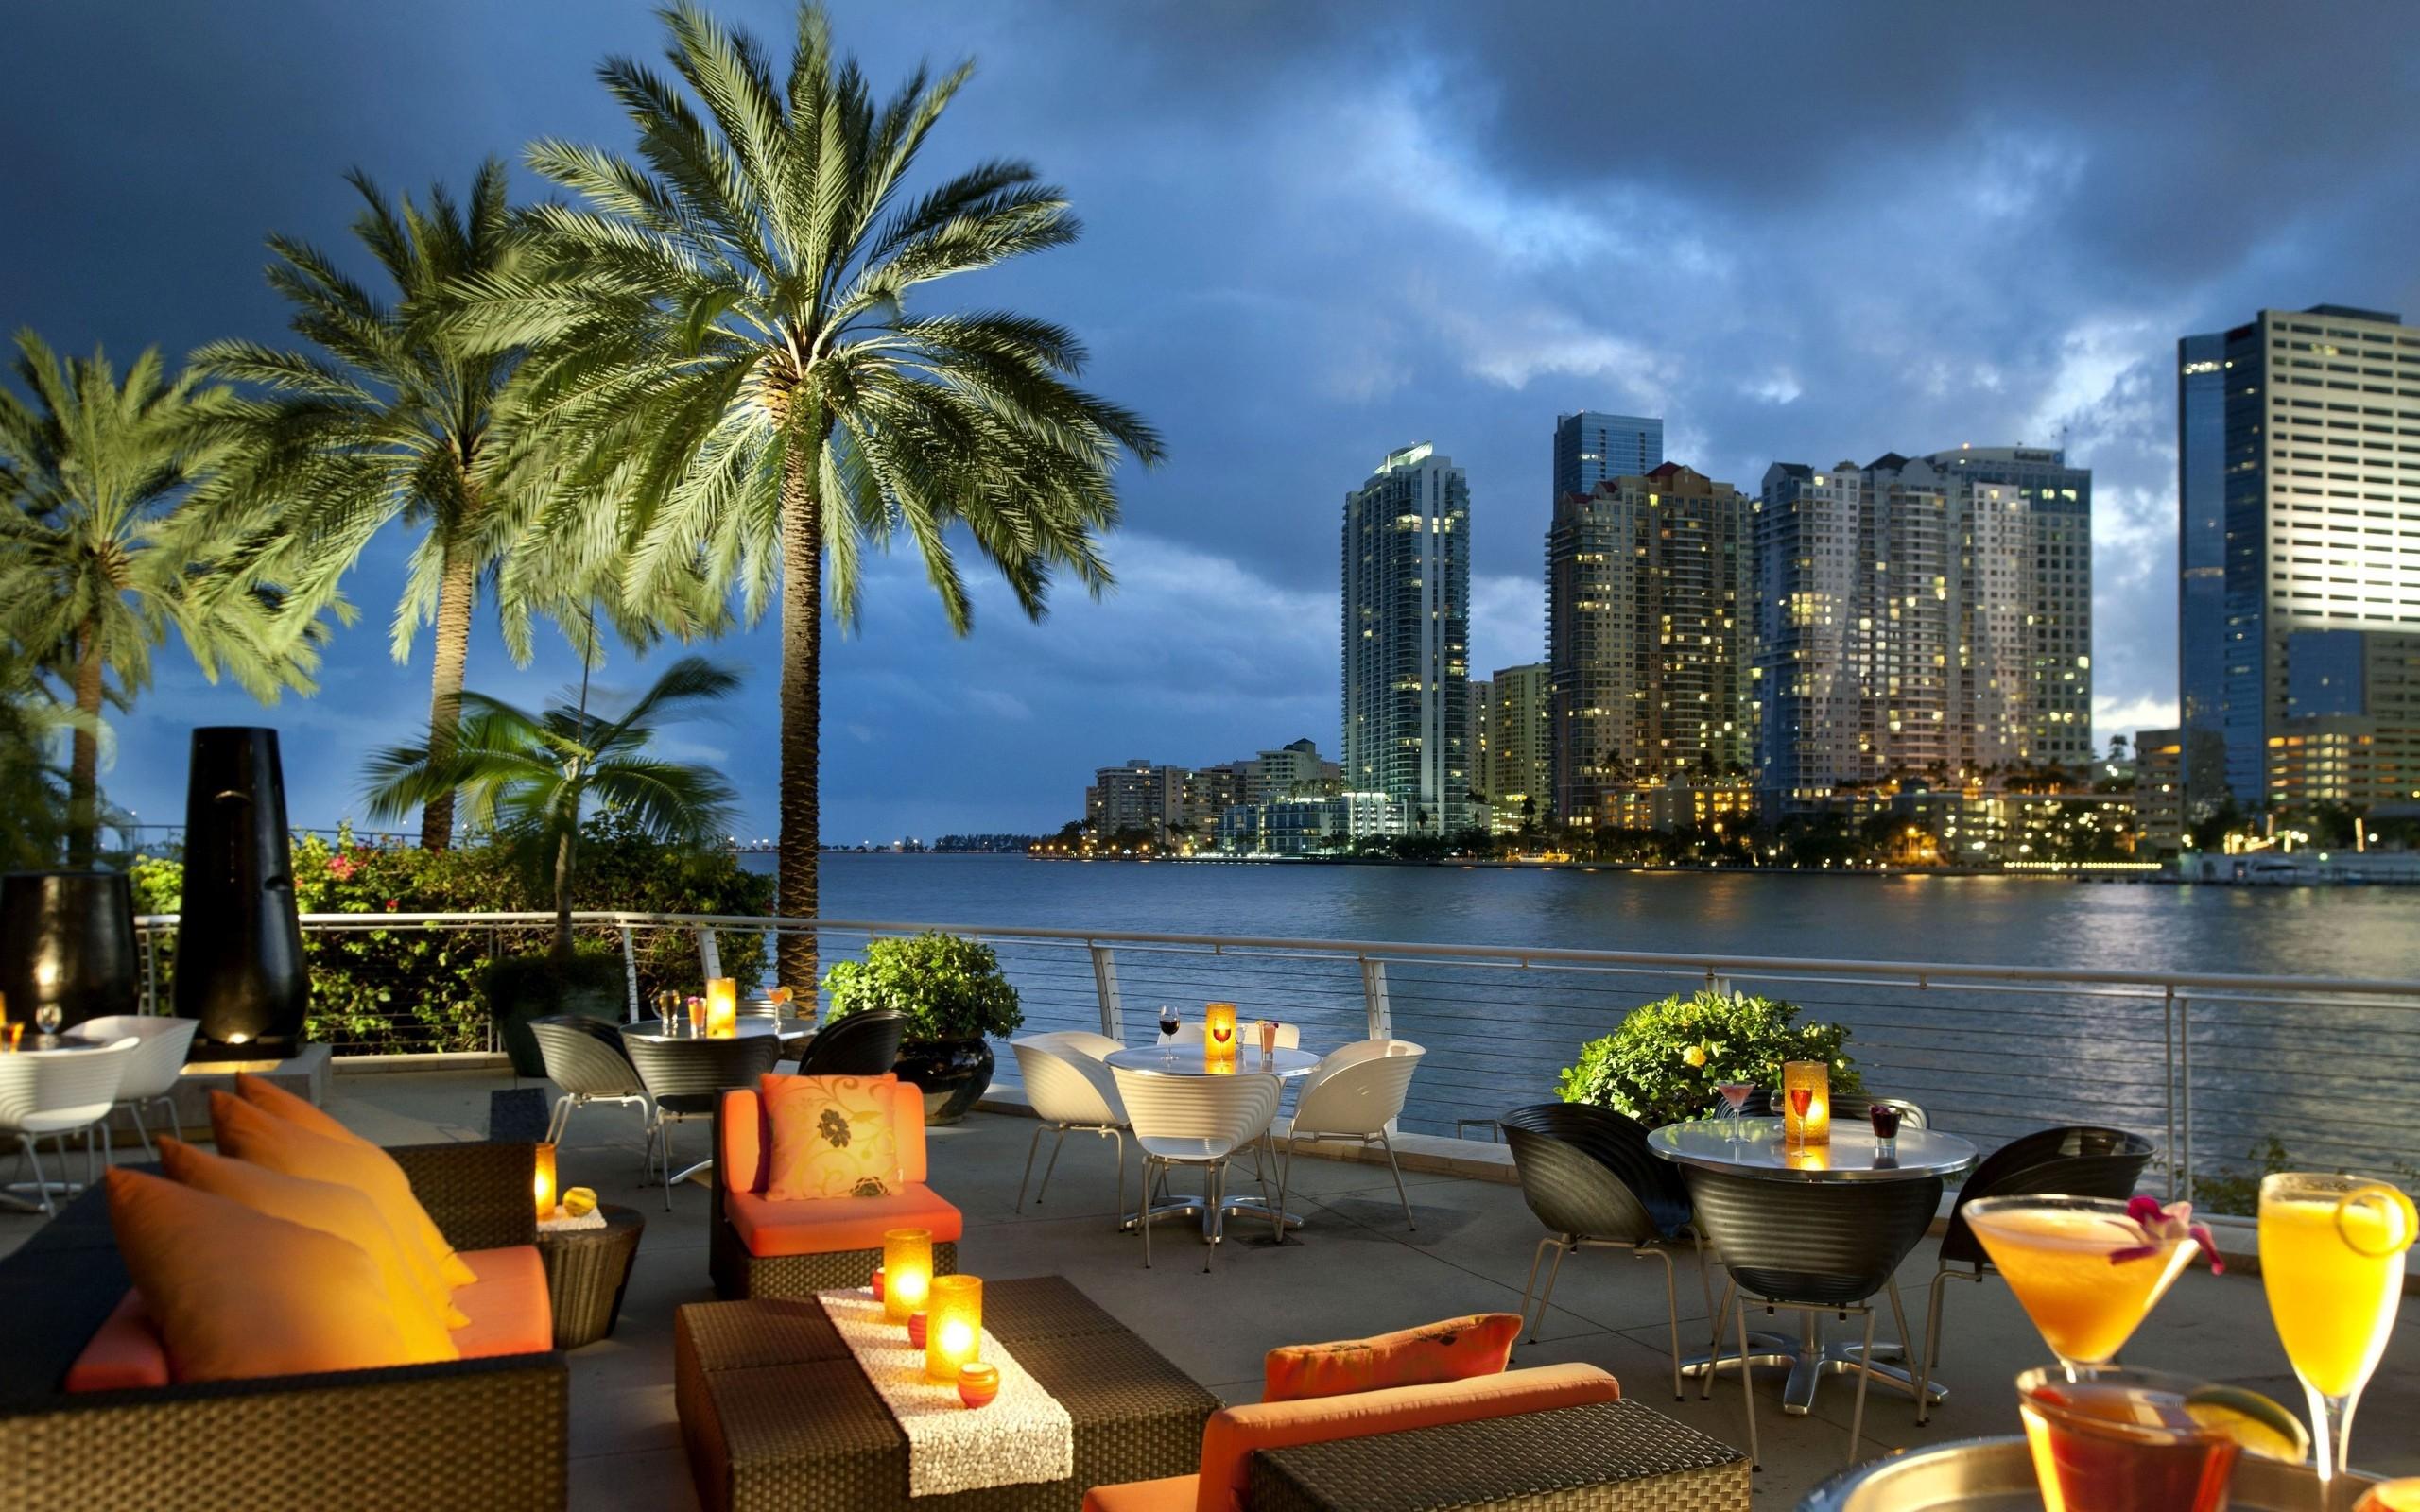 Miami Patio Wallpapers Miami Patio Myspace Backgrounds Miami Patio 2560x1600